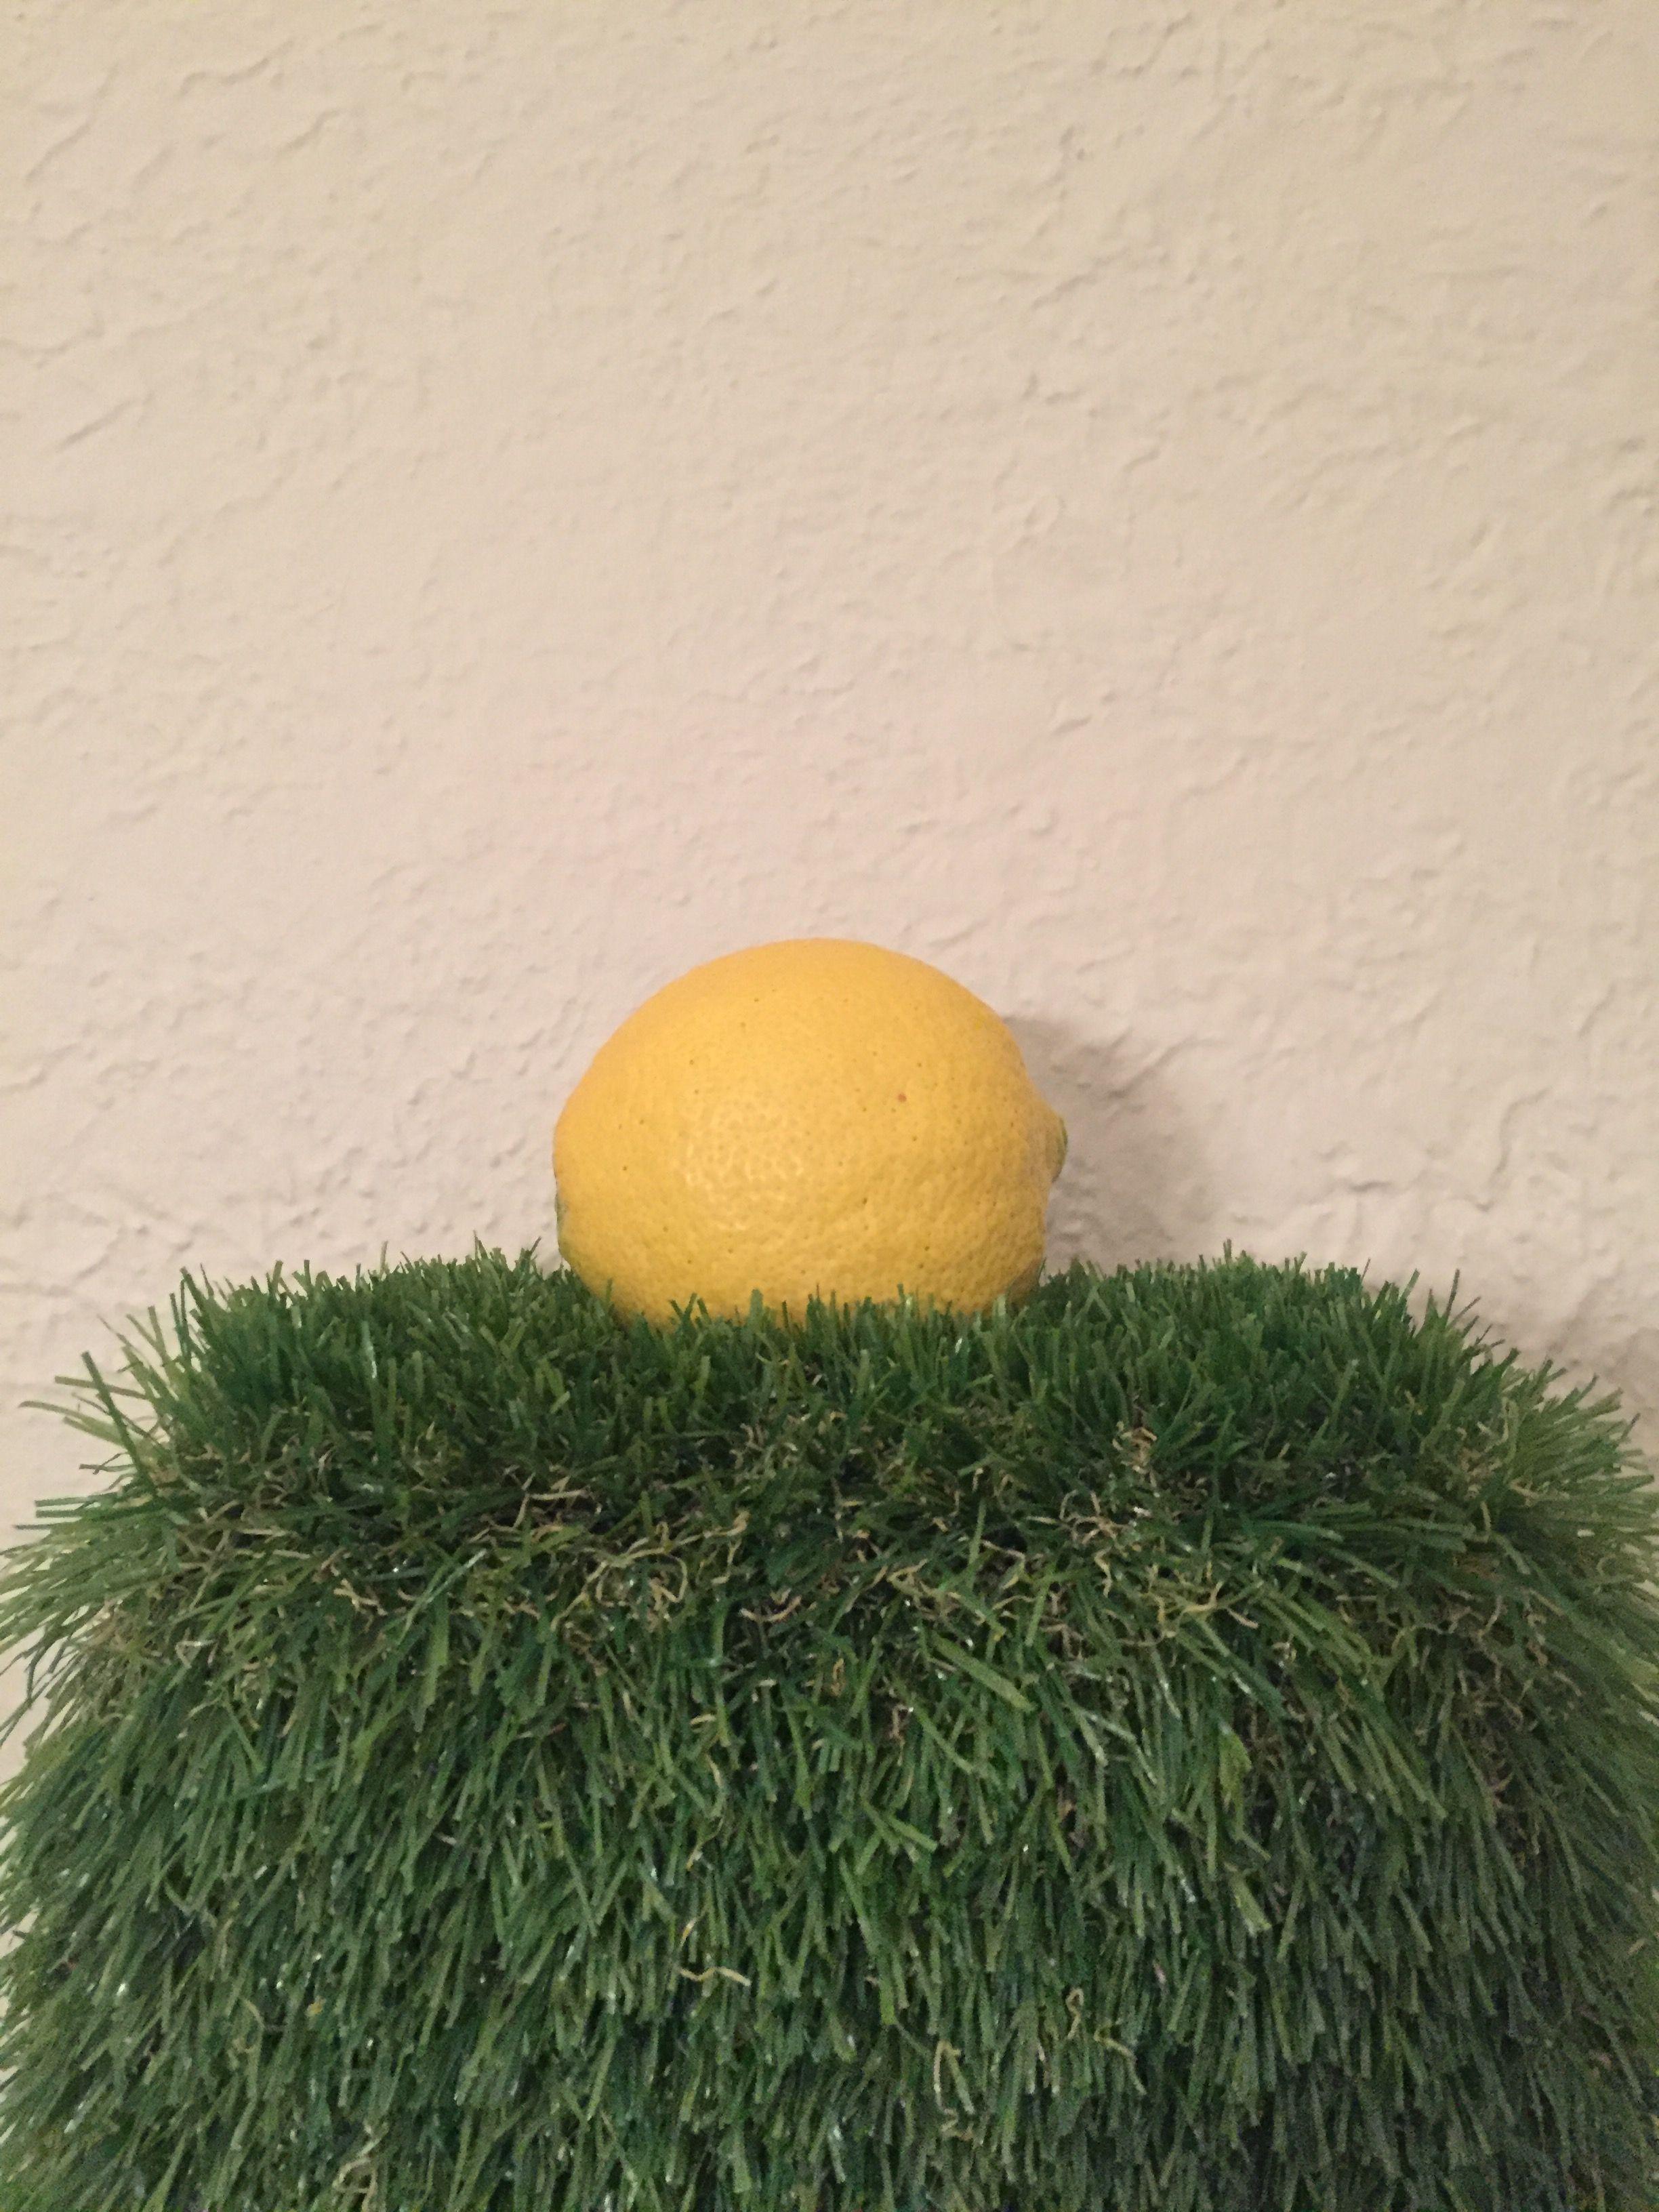 Fruit Star  Home Made Diy Alternative Astroturf Artificial Turf